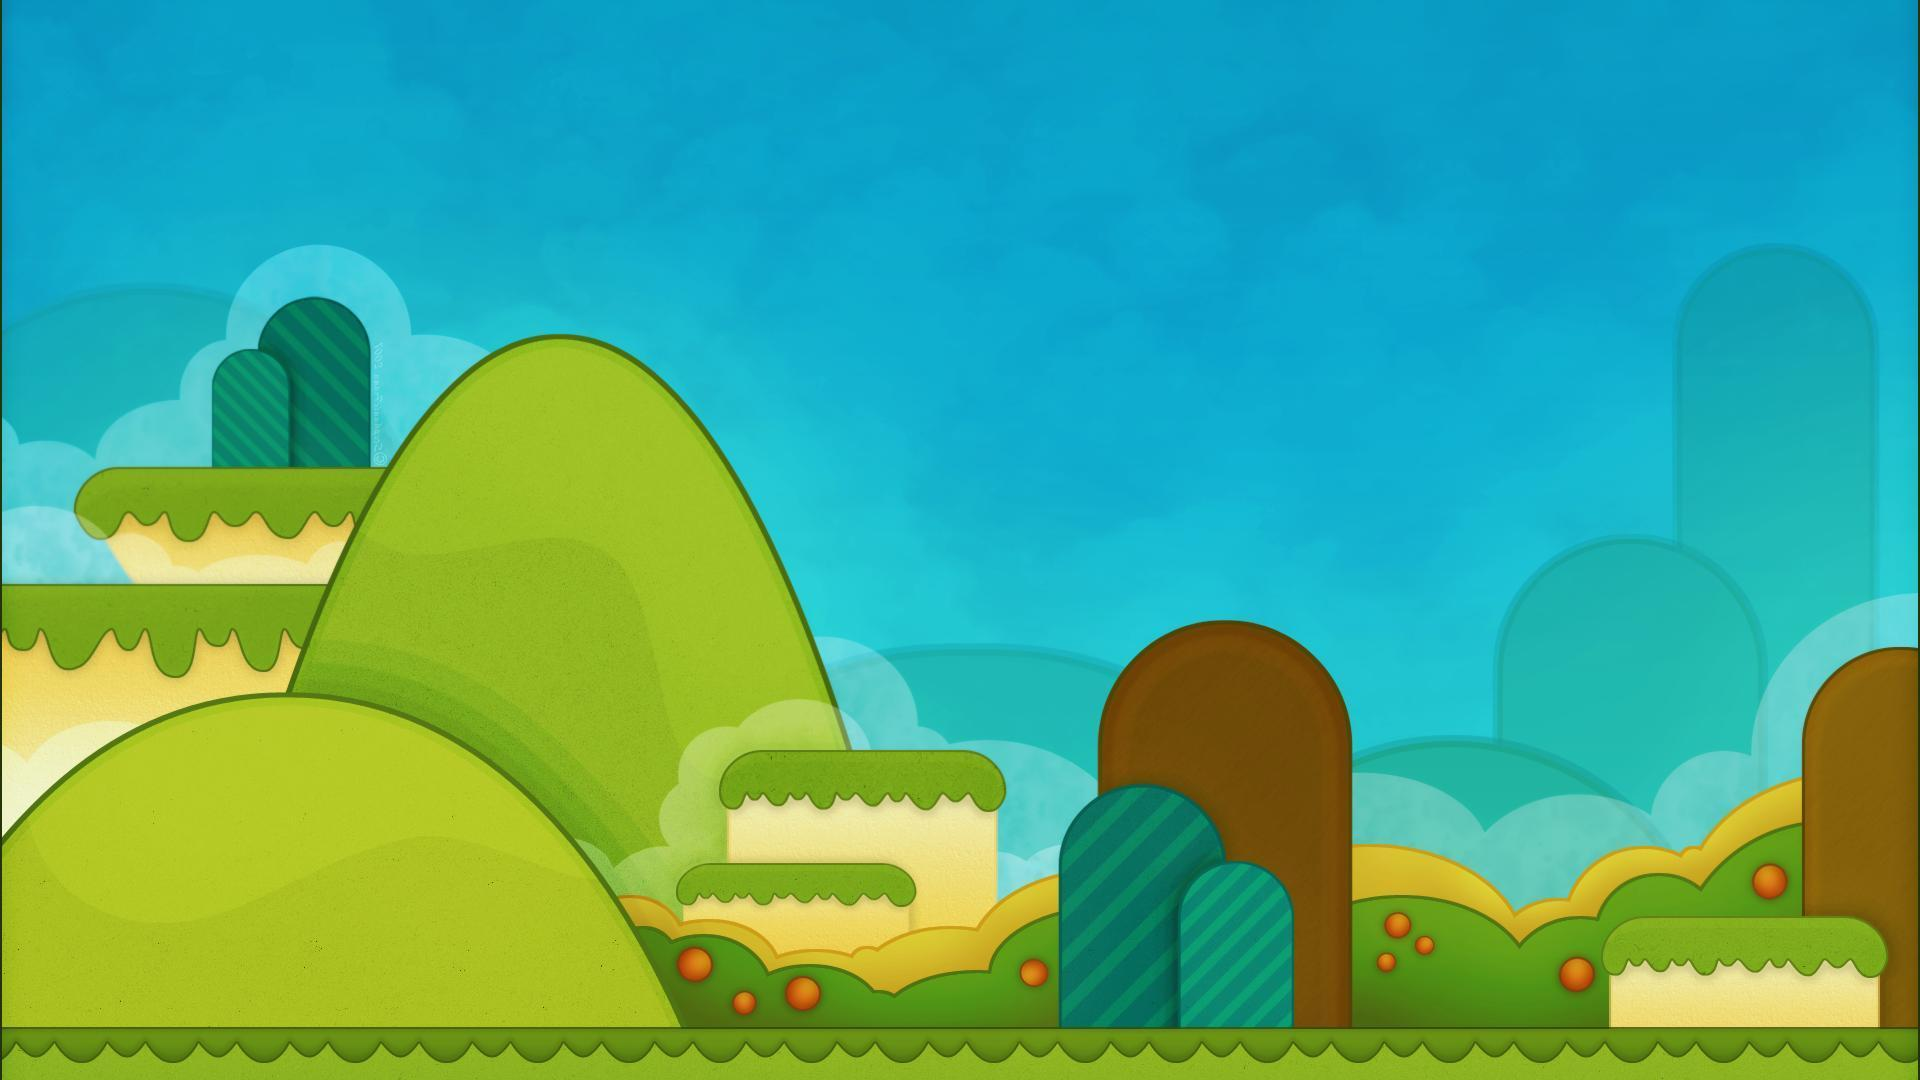 Mario Wallpapers HD - Wallpaper Cave